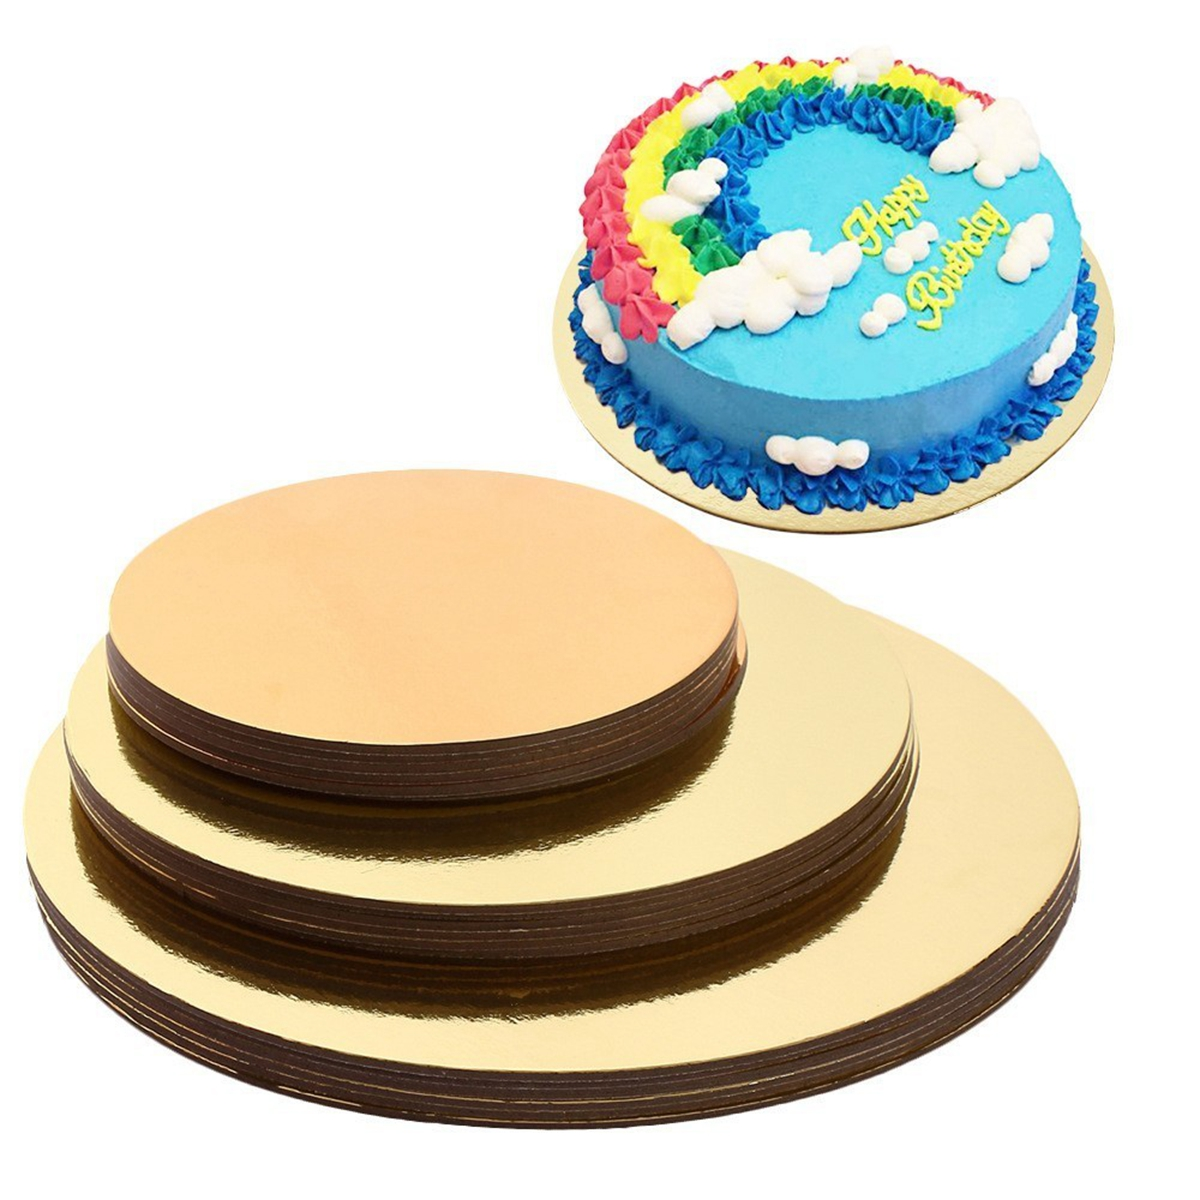 8/10/12 Inch Round Wedding Birthday Cake Boards Food Grade Gold Card Board Baking Cake Hard Paper Pad Baking Making Tool Dessert